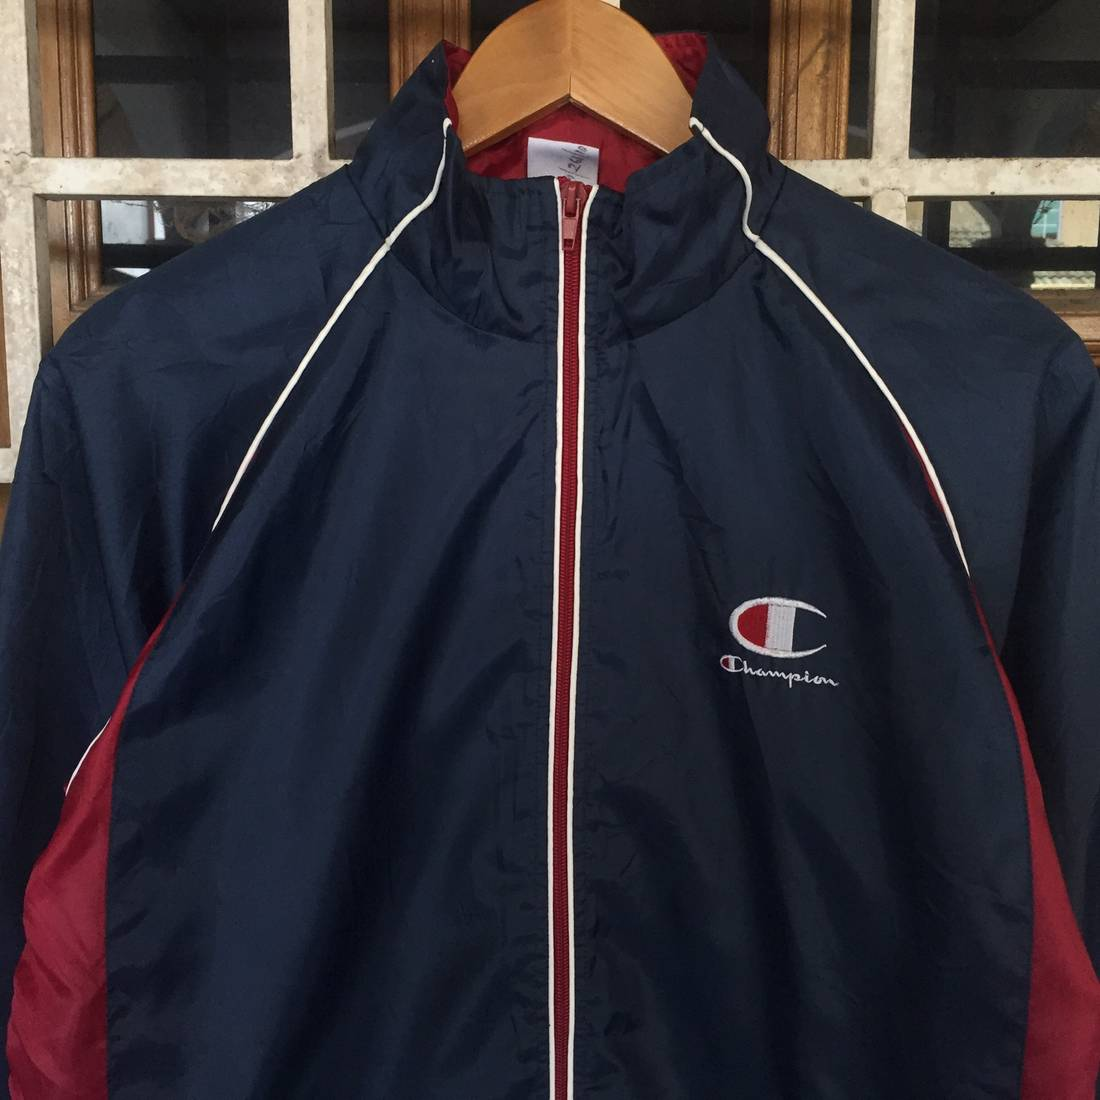 Sale!! CHAMPION Jacket Windbreaker Full Zipper Excellent Condition Medium Size 3unvK1